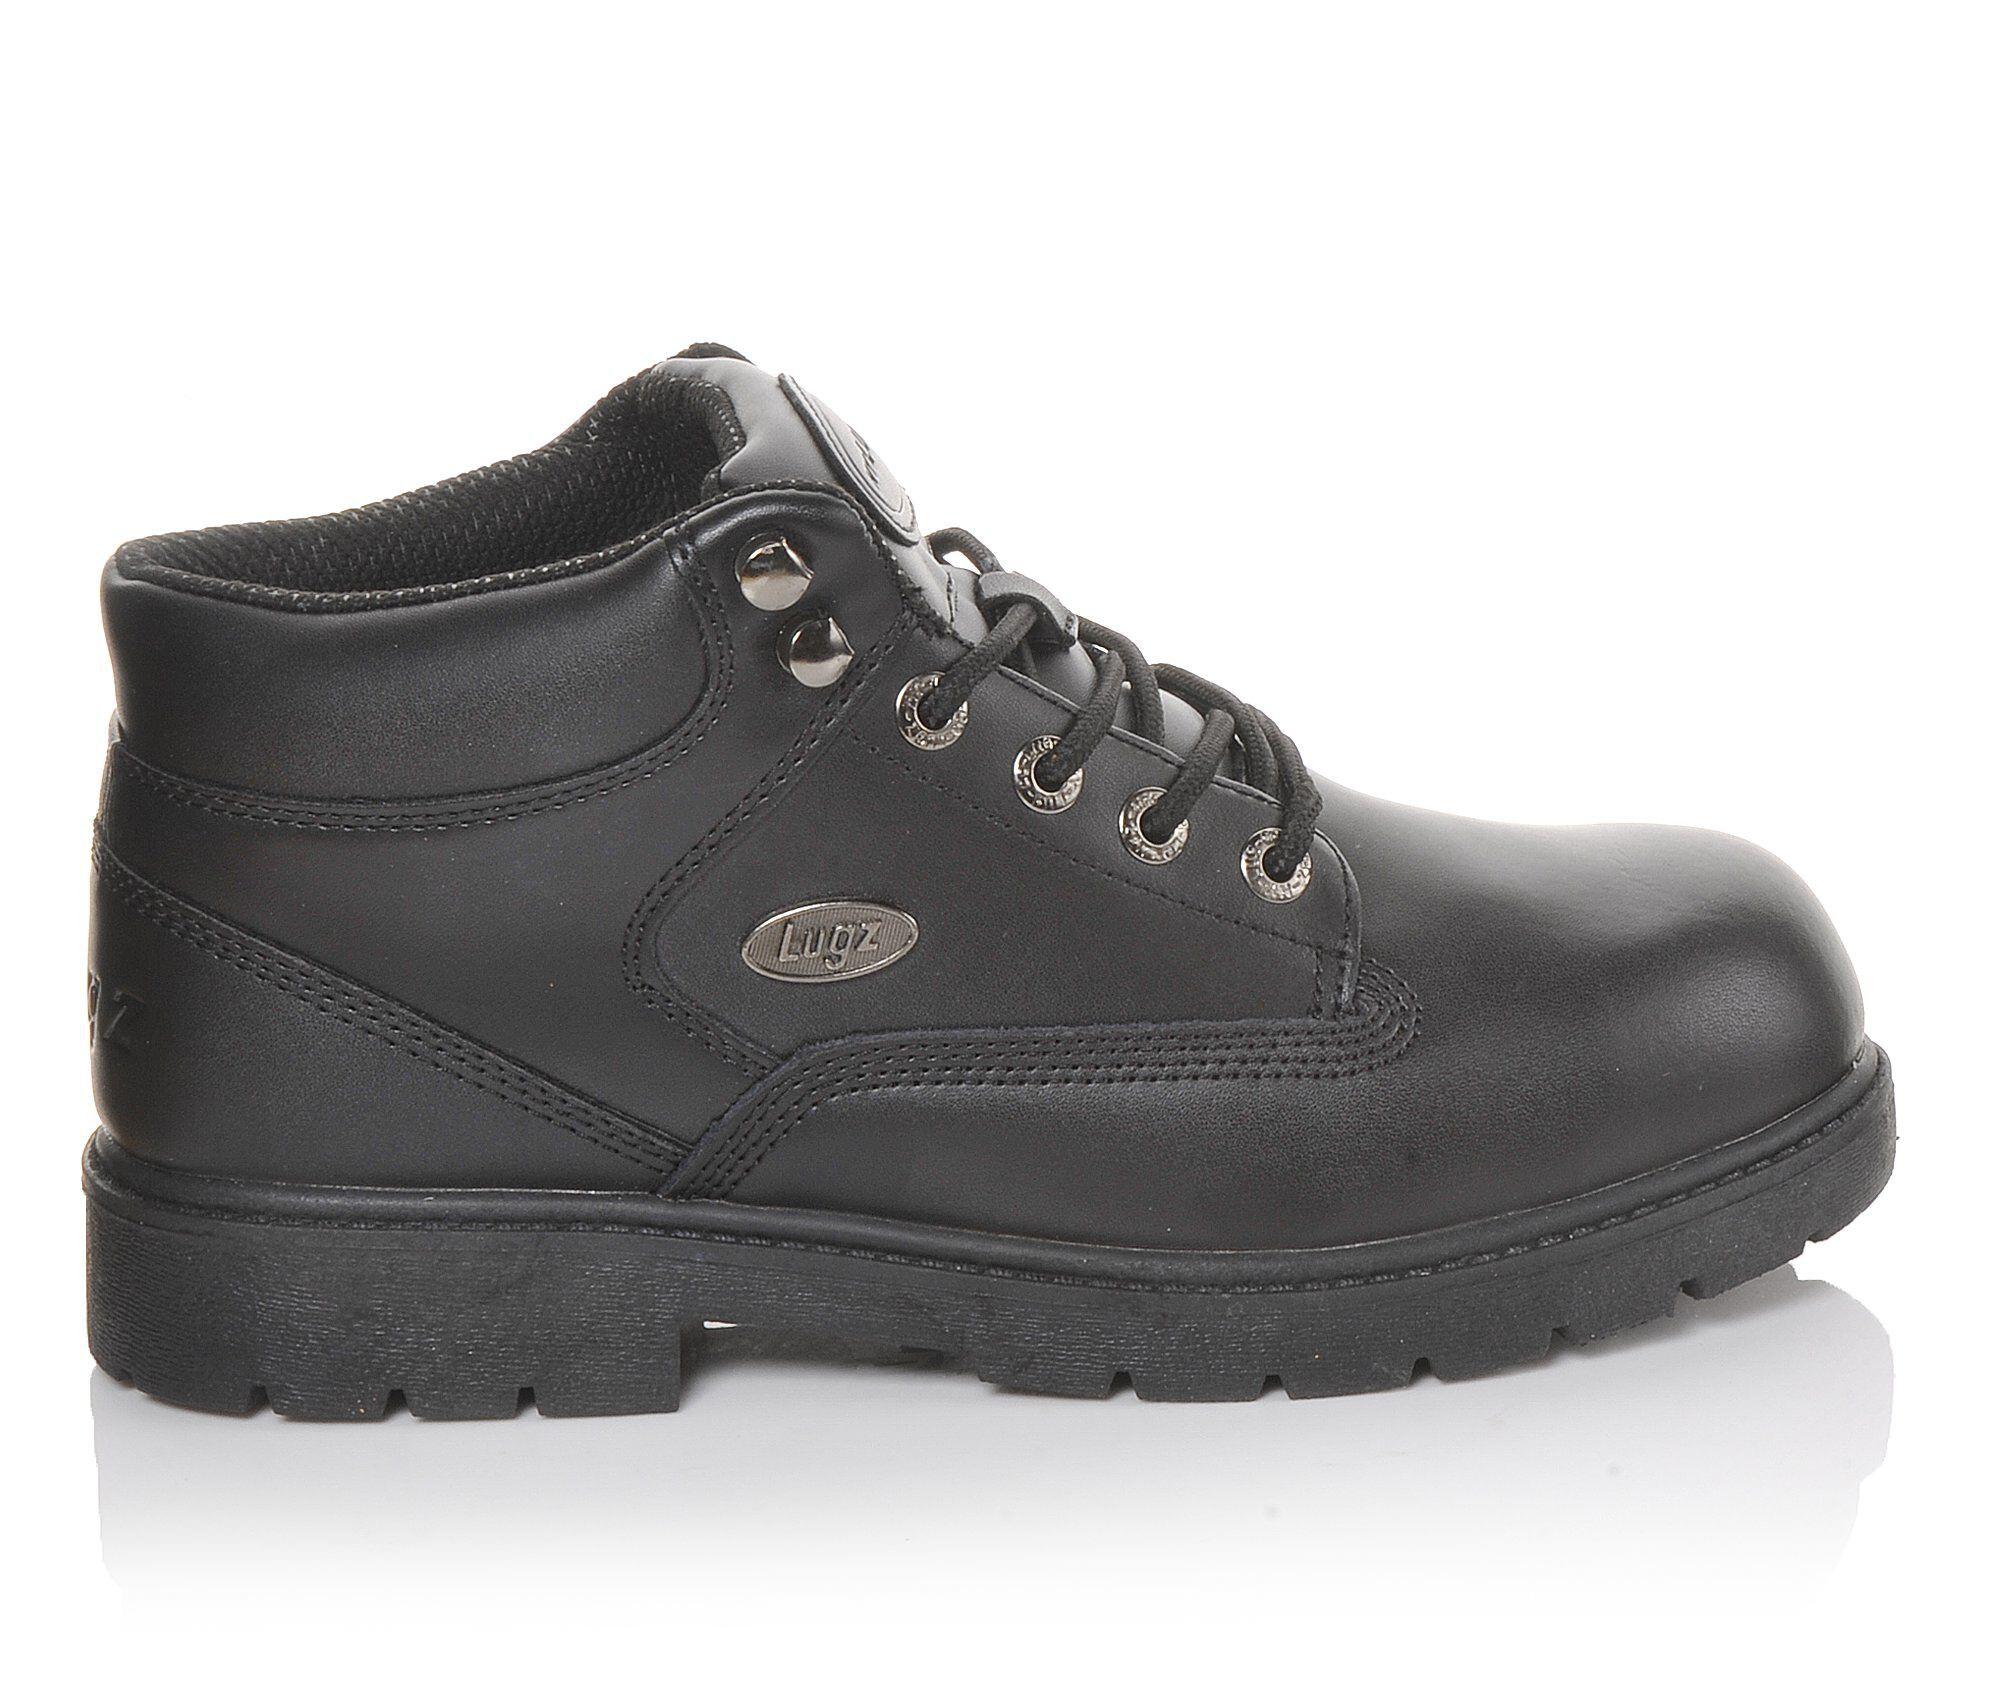 Men's Lugz Zone Hi Slip Resistant Boots Black